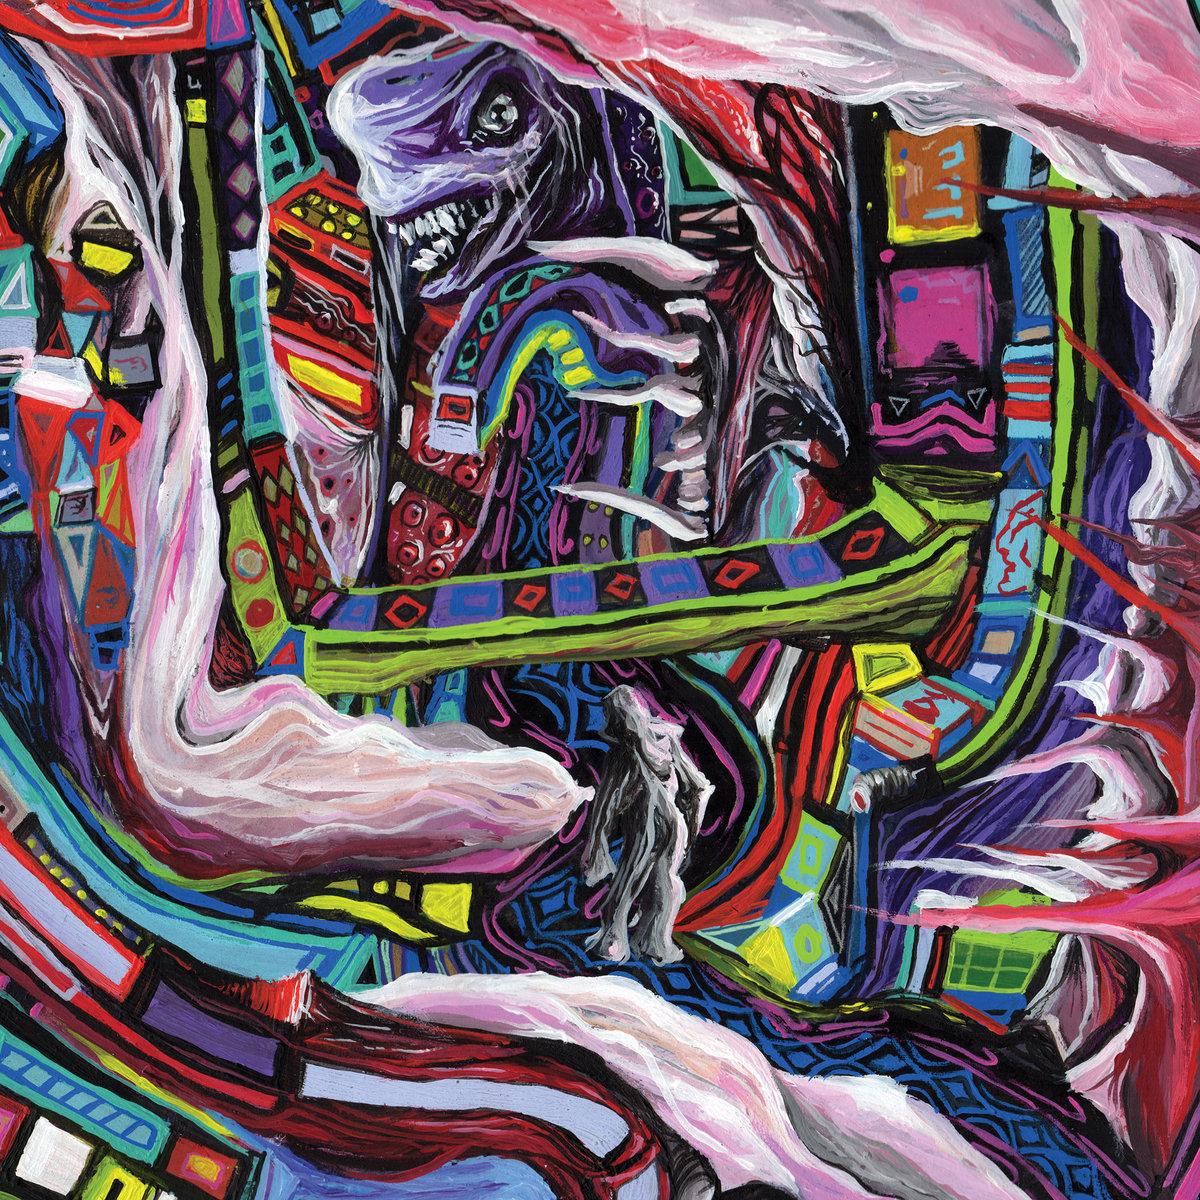 Yautja - The Lurch [LP] (Neon Violet Vinyl)